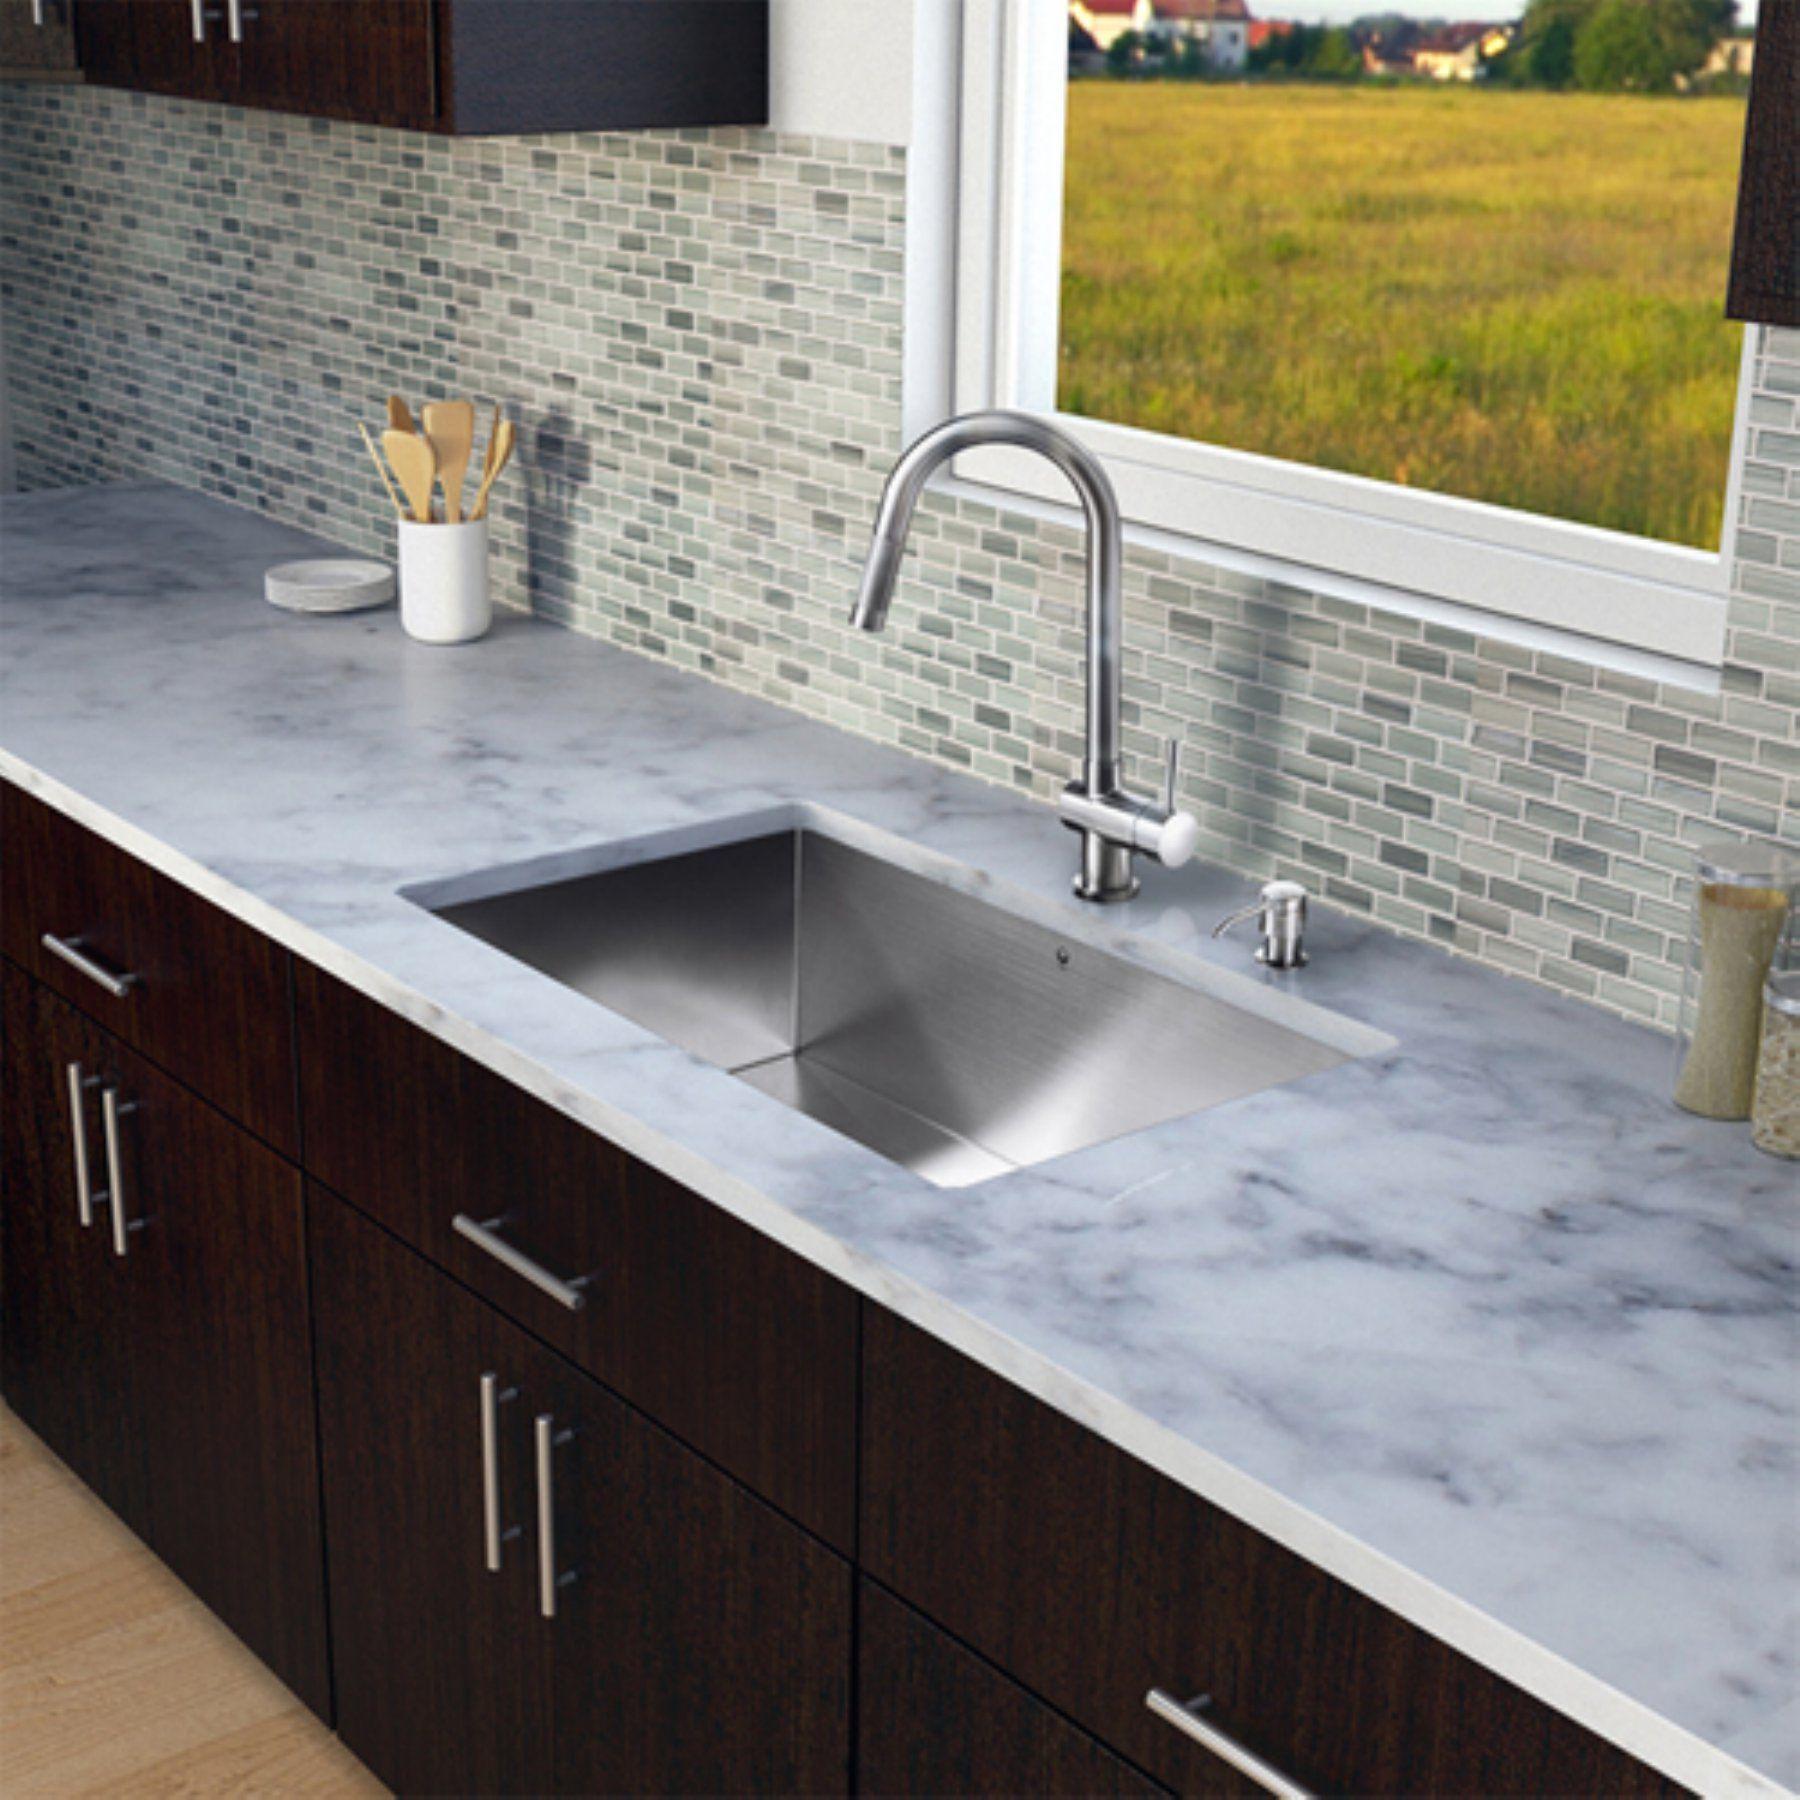 Vigo Vg15150 Single Basin Undermount Kitchen Sink And Faucet Set